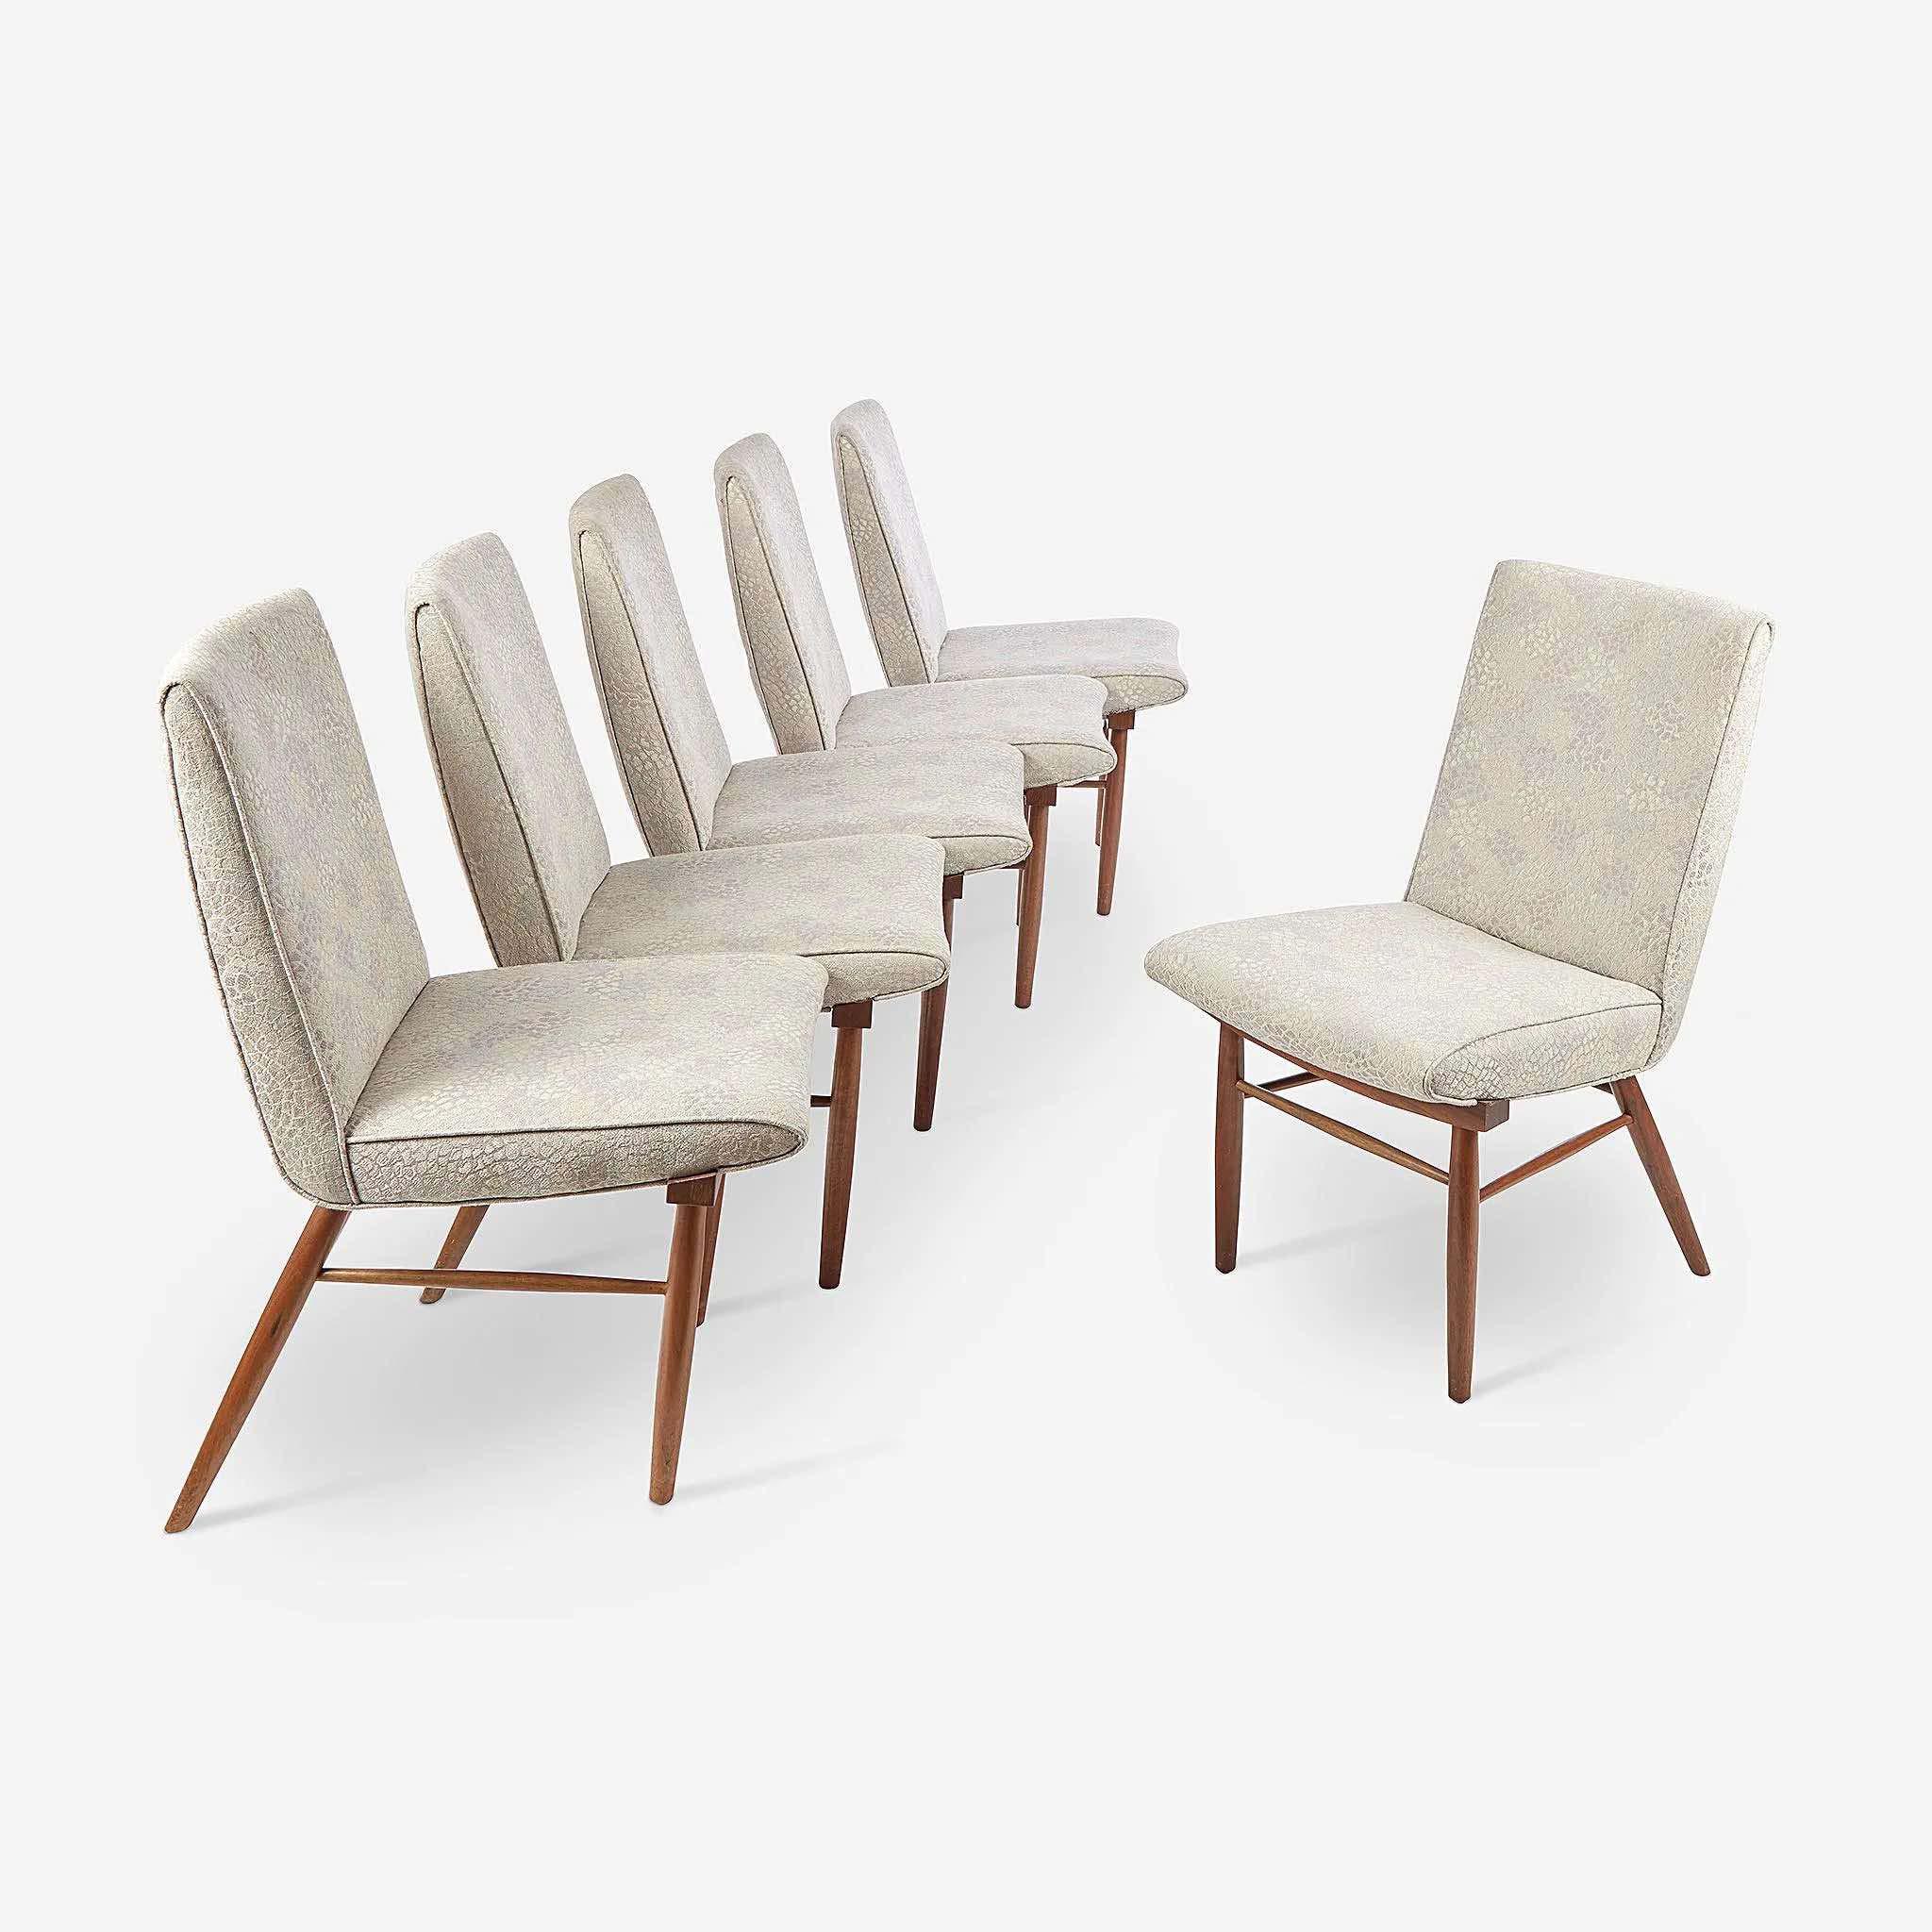 George Nakashima (American, 1905-1990), set of six 'Origins' side chairs, 1960s, $17,000 plus buyer's premium. Image courtesy Freeman's